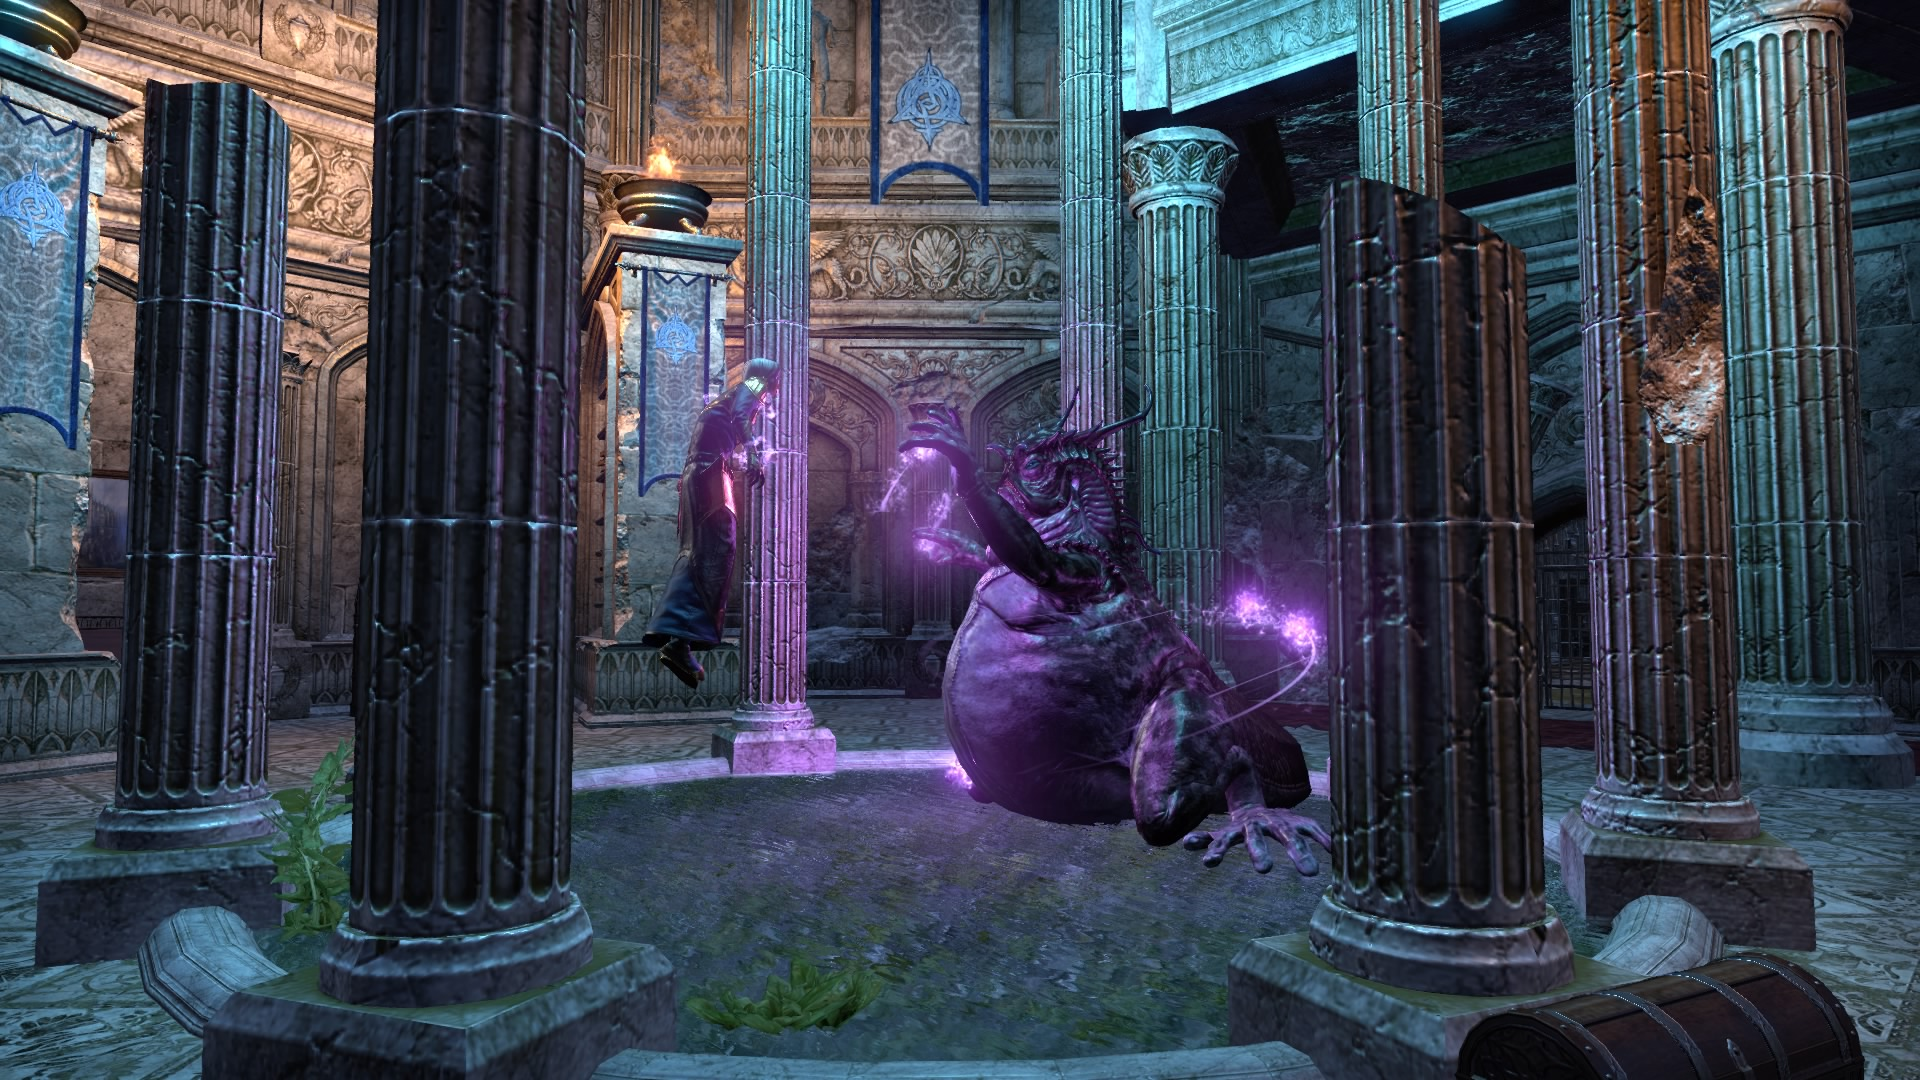 K'Tora flipping through the Ritemaster's mind